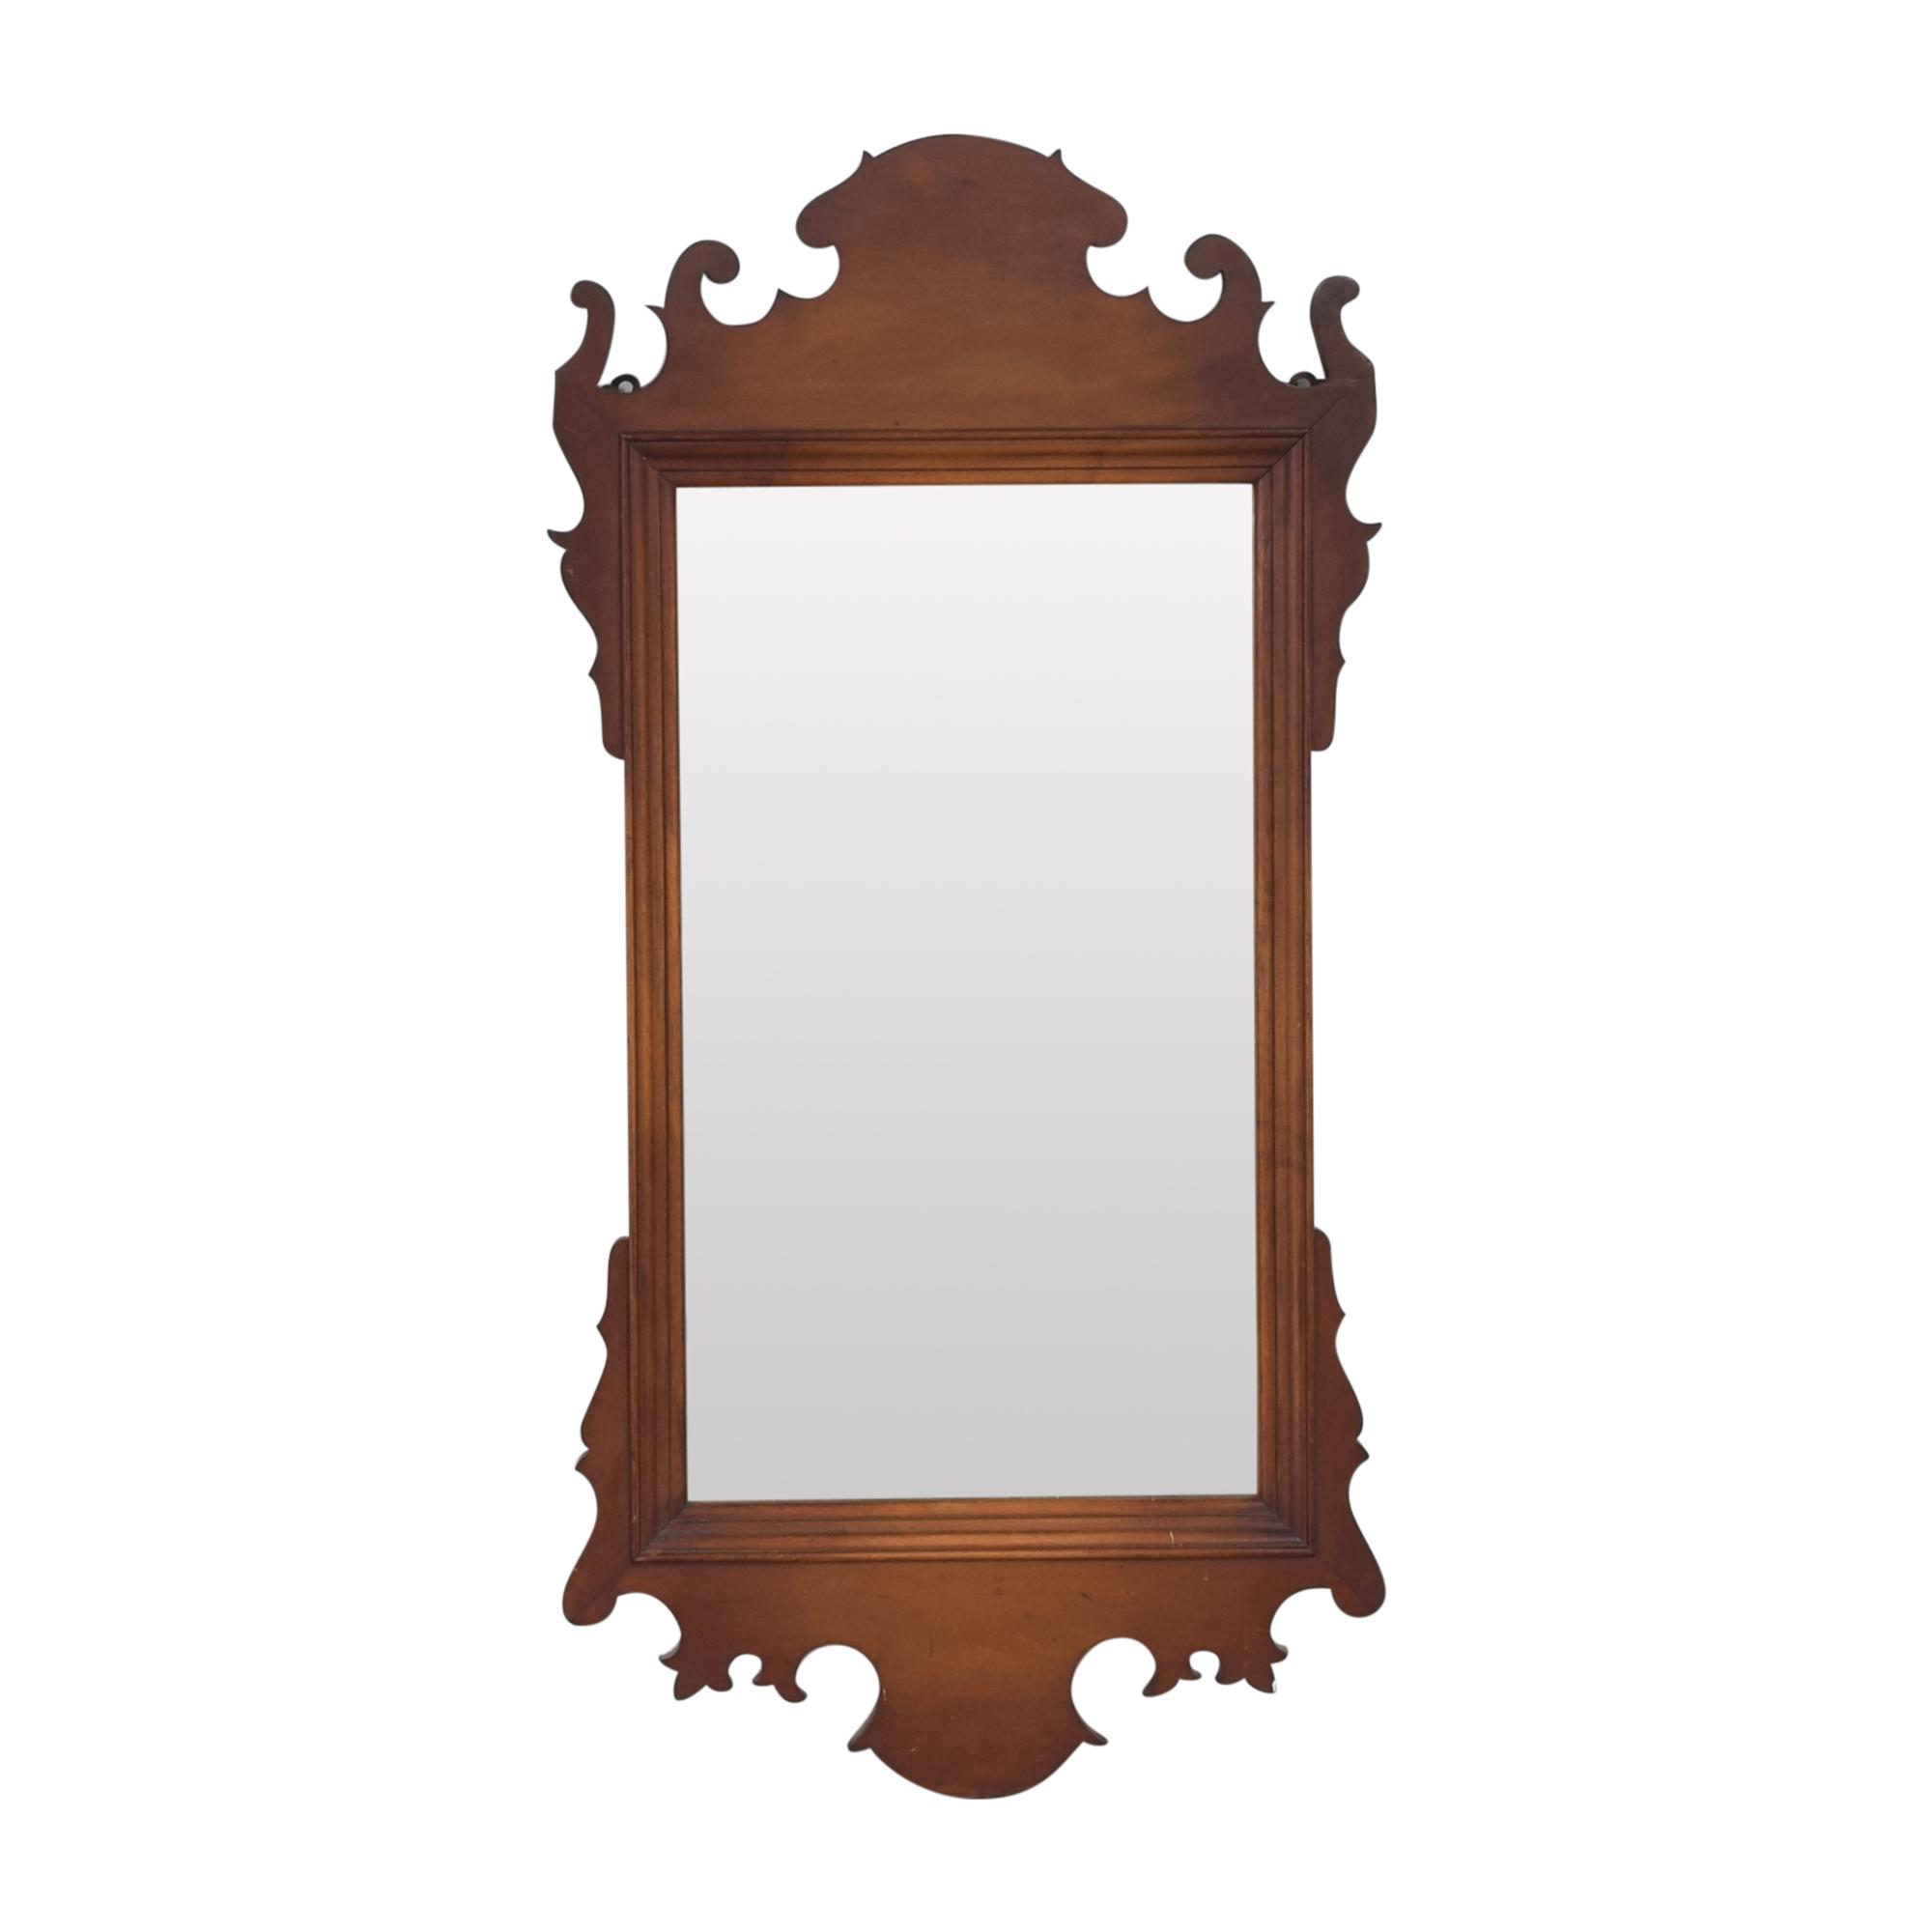 Flint & Horner Flint & Horner Decorative Wall Mirror